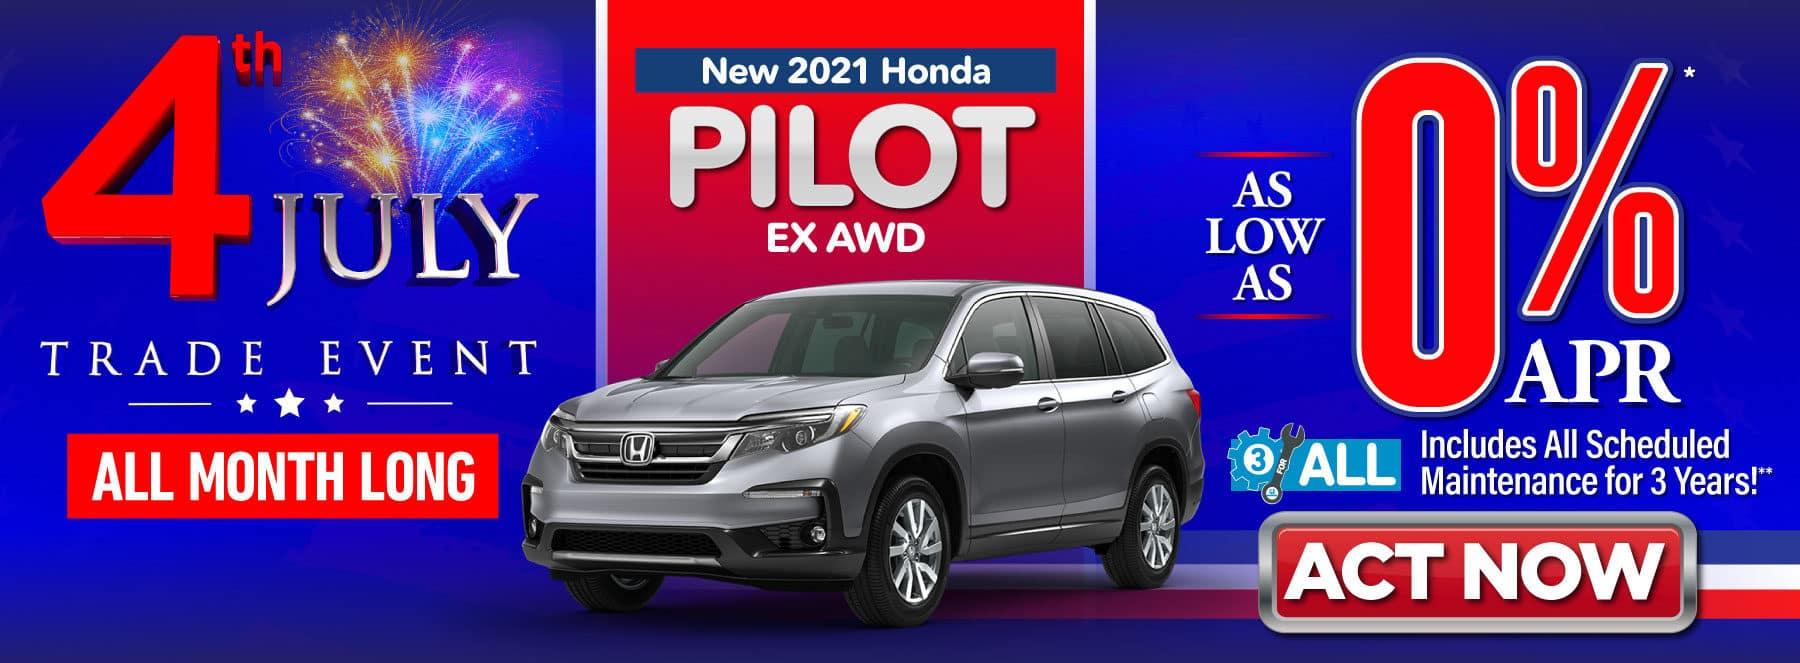 New 2021 Honda Pilot EX AWD - As Low As 0% APR - ACT NOW